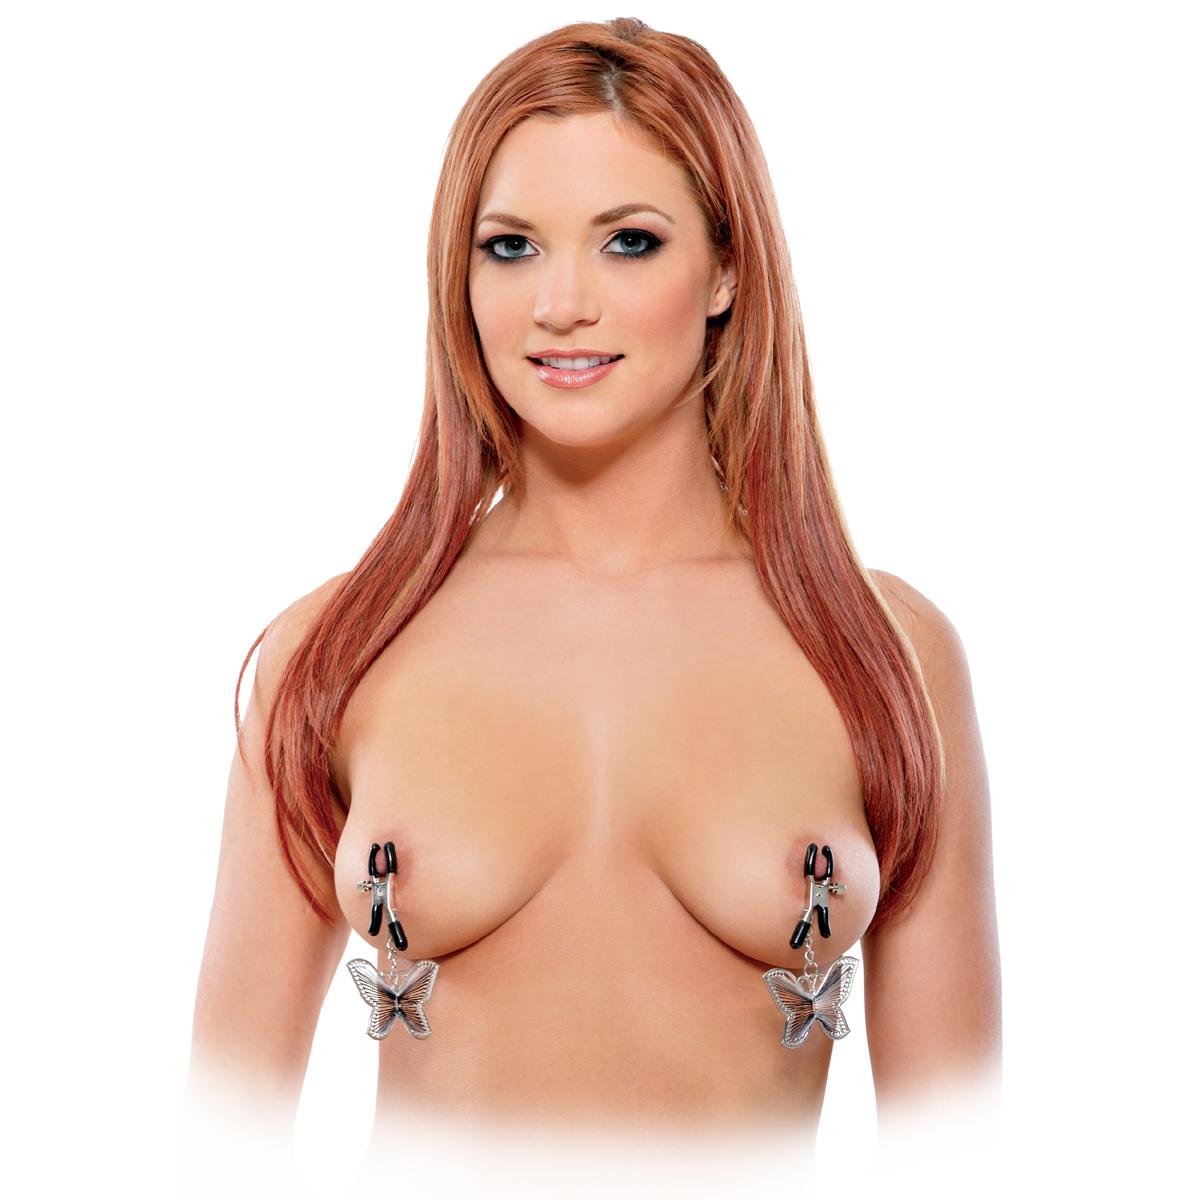 Зажимы на соски с бабочками Butterfly Nipple Clamps. Вид 1.